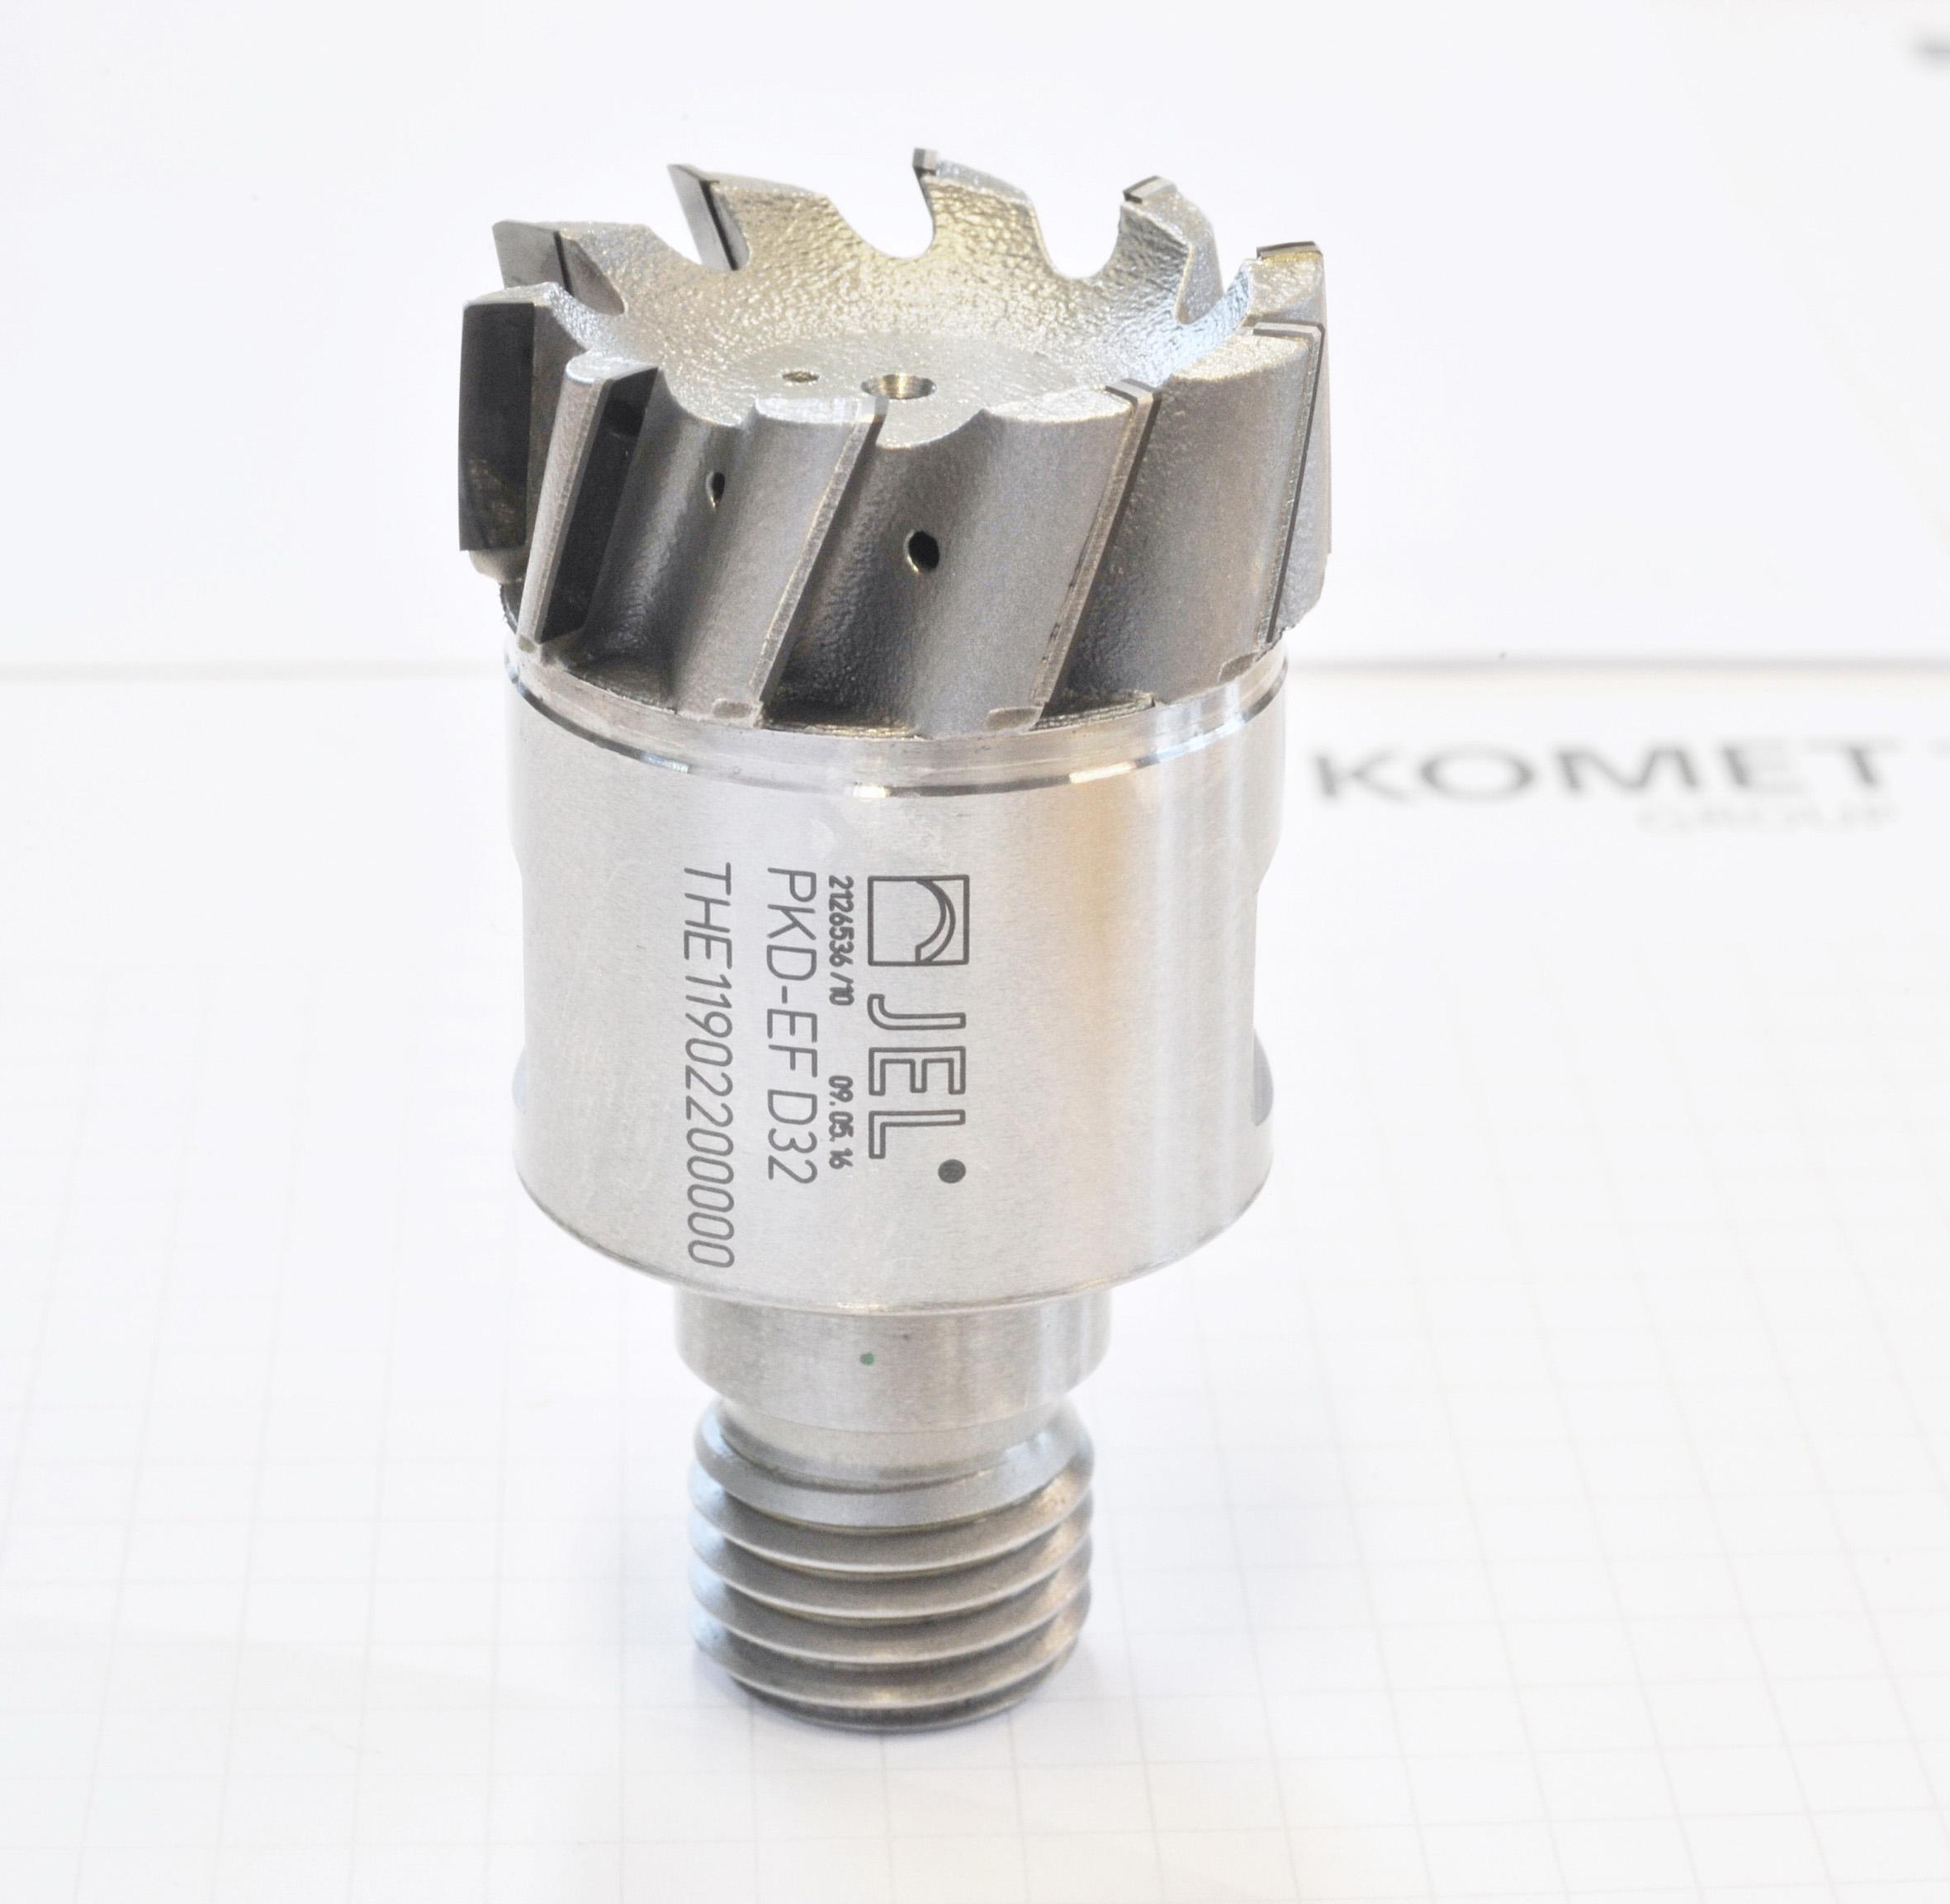 KOMET® GROUP innovates cutting tools using metal 3D printing technology